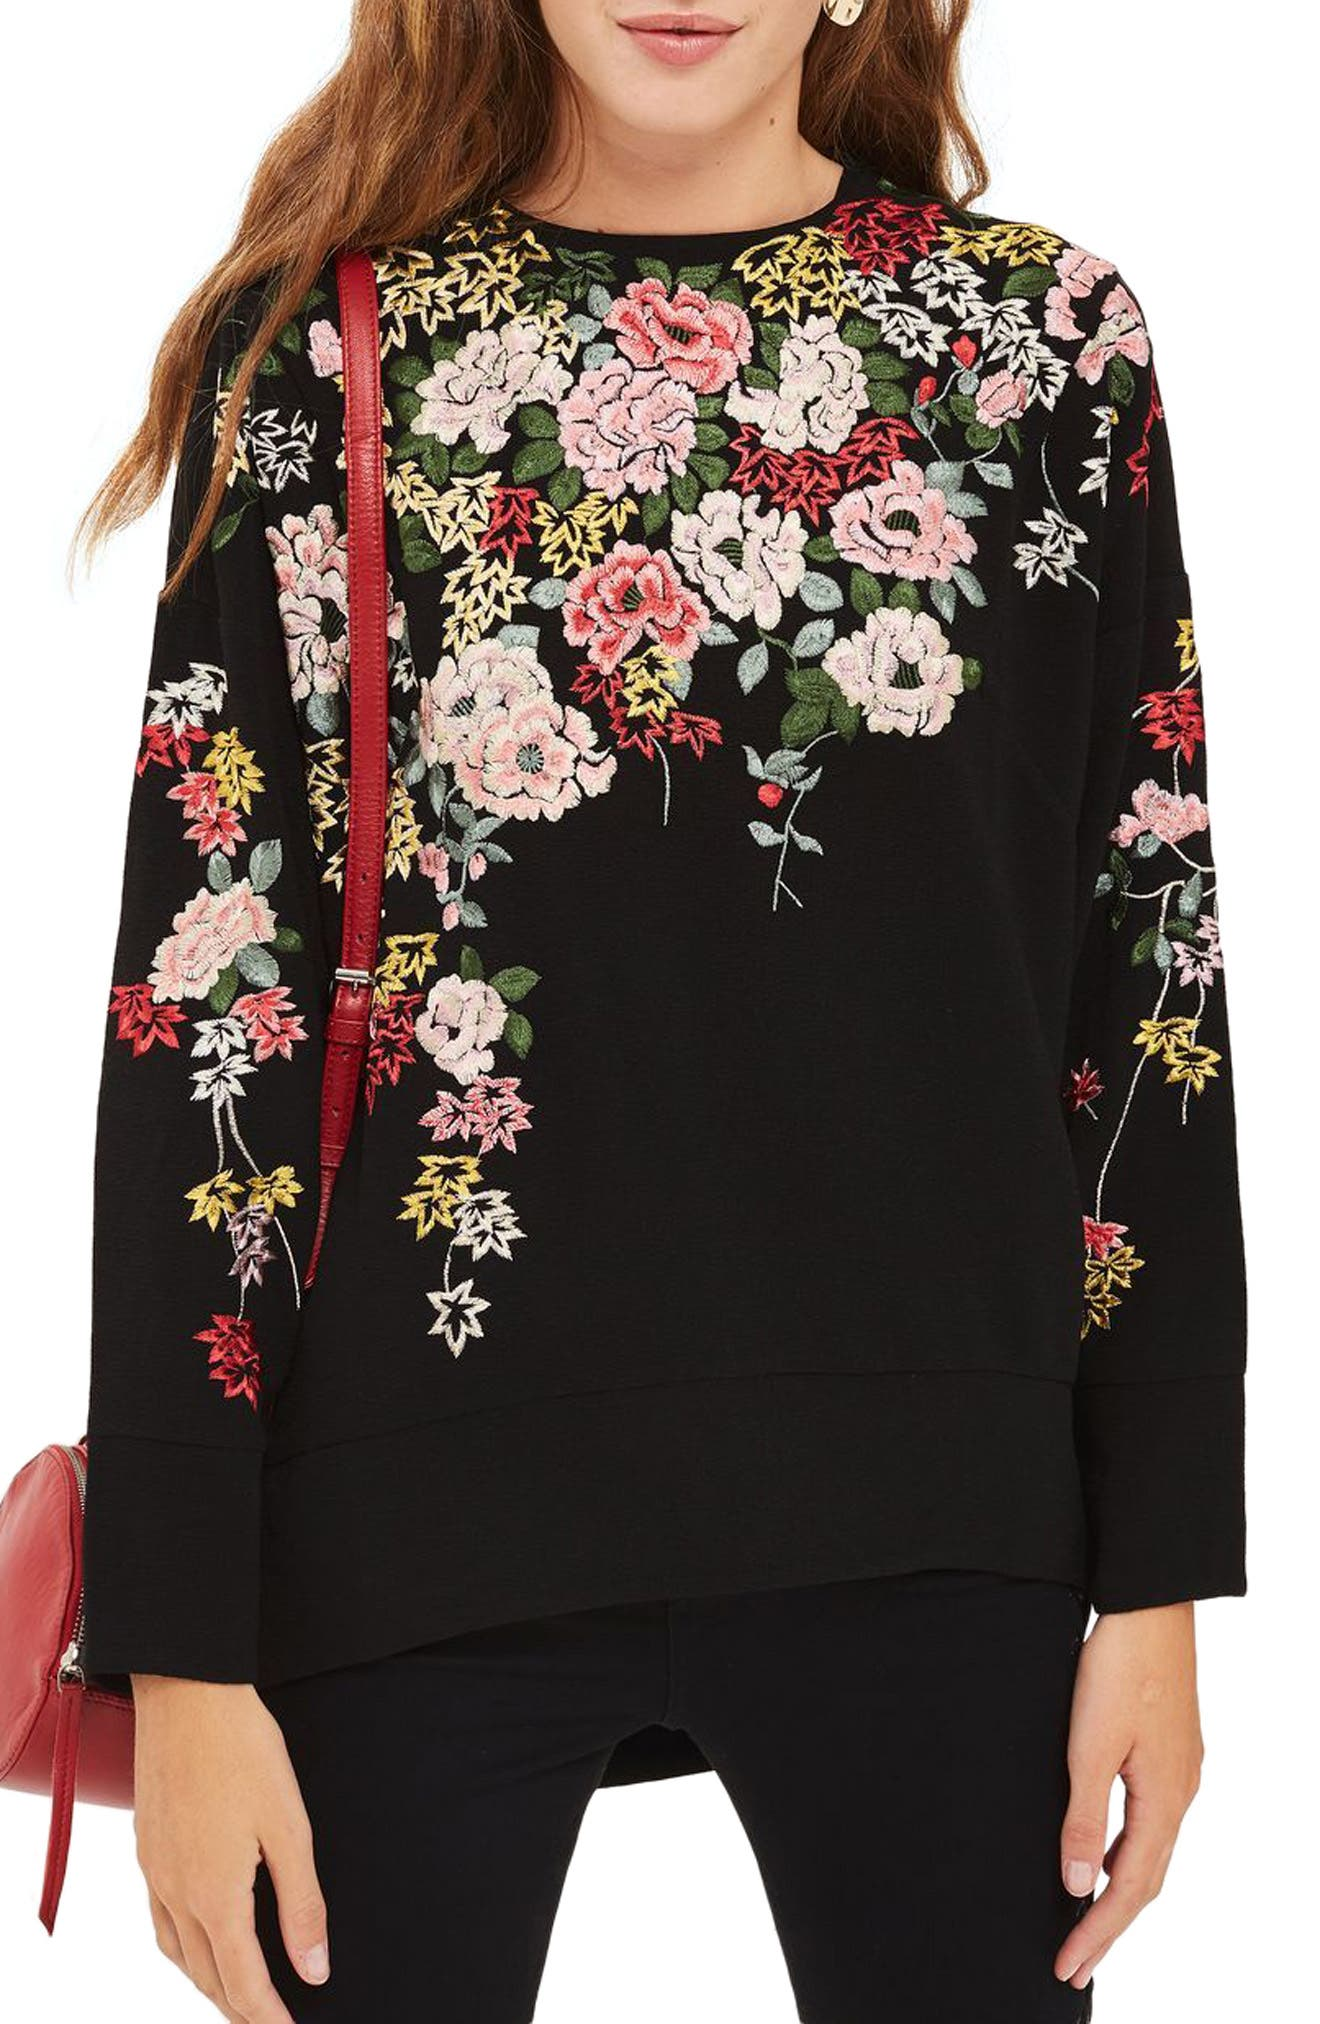 Alternate Image 1 Selected - Topshop Kimono Embroidered Sweatshirt